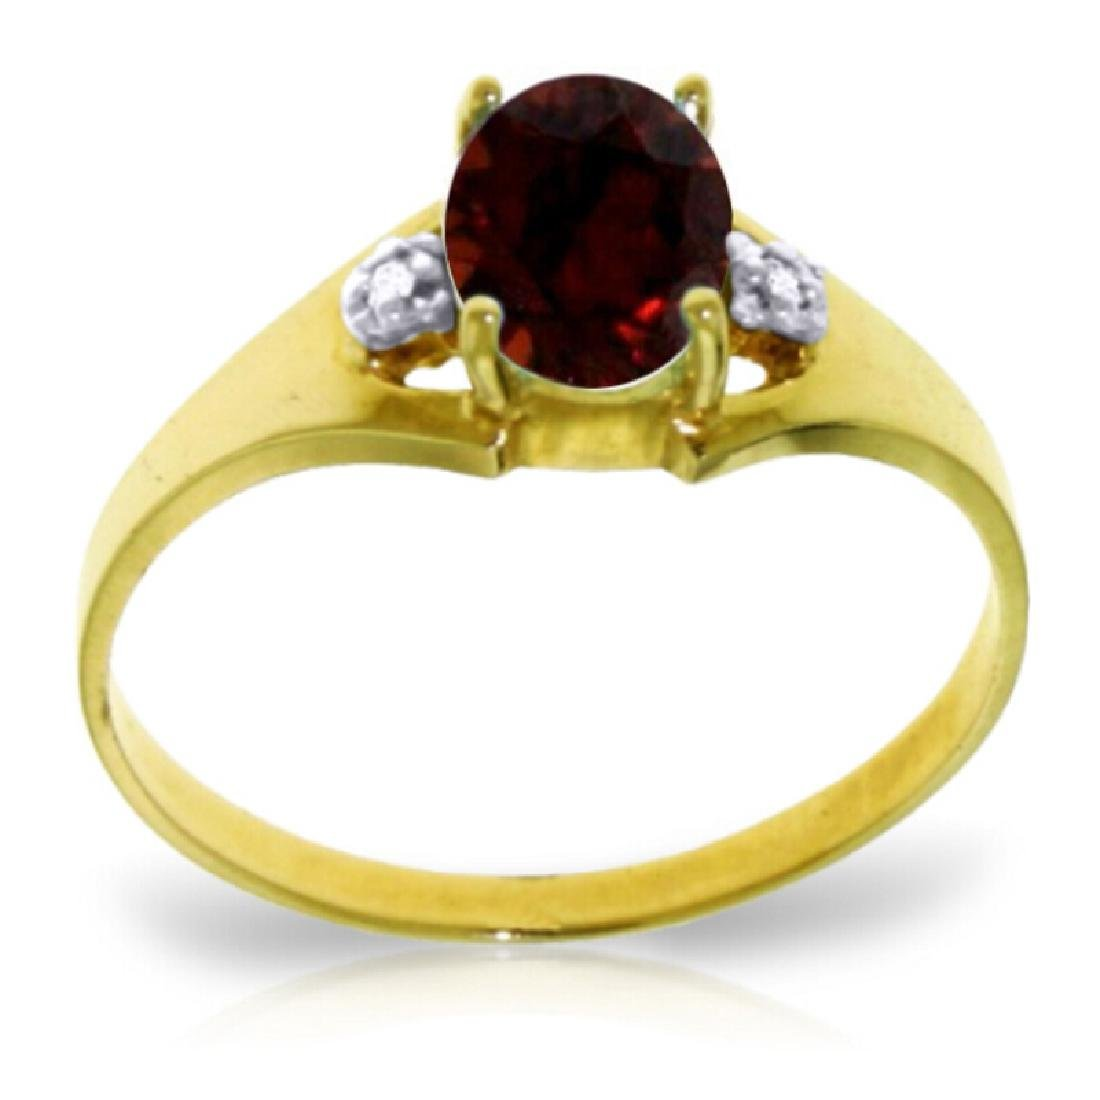 Genuine 0.76 ctw Garnet & Diamond Ring Jewelry 14KT